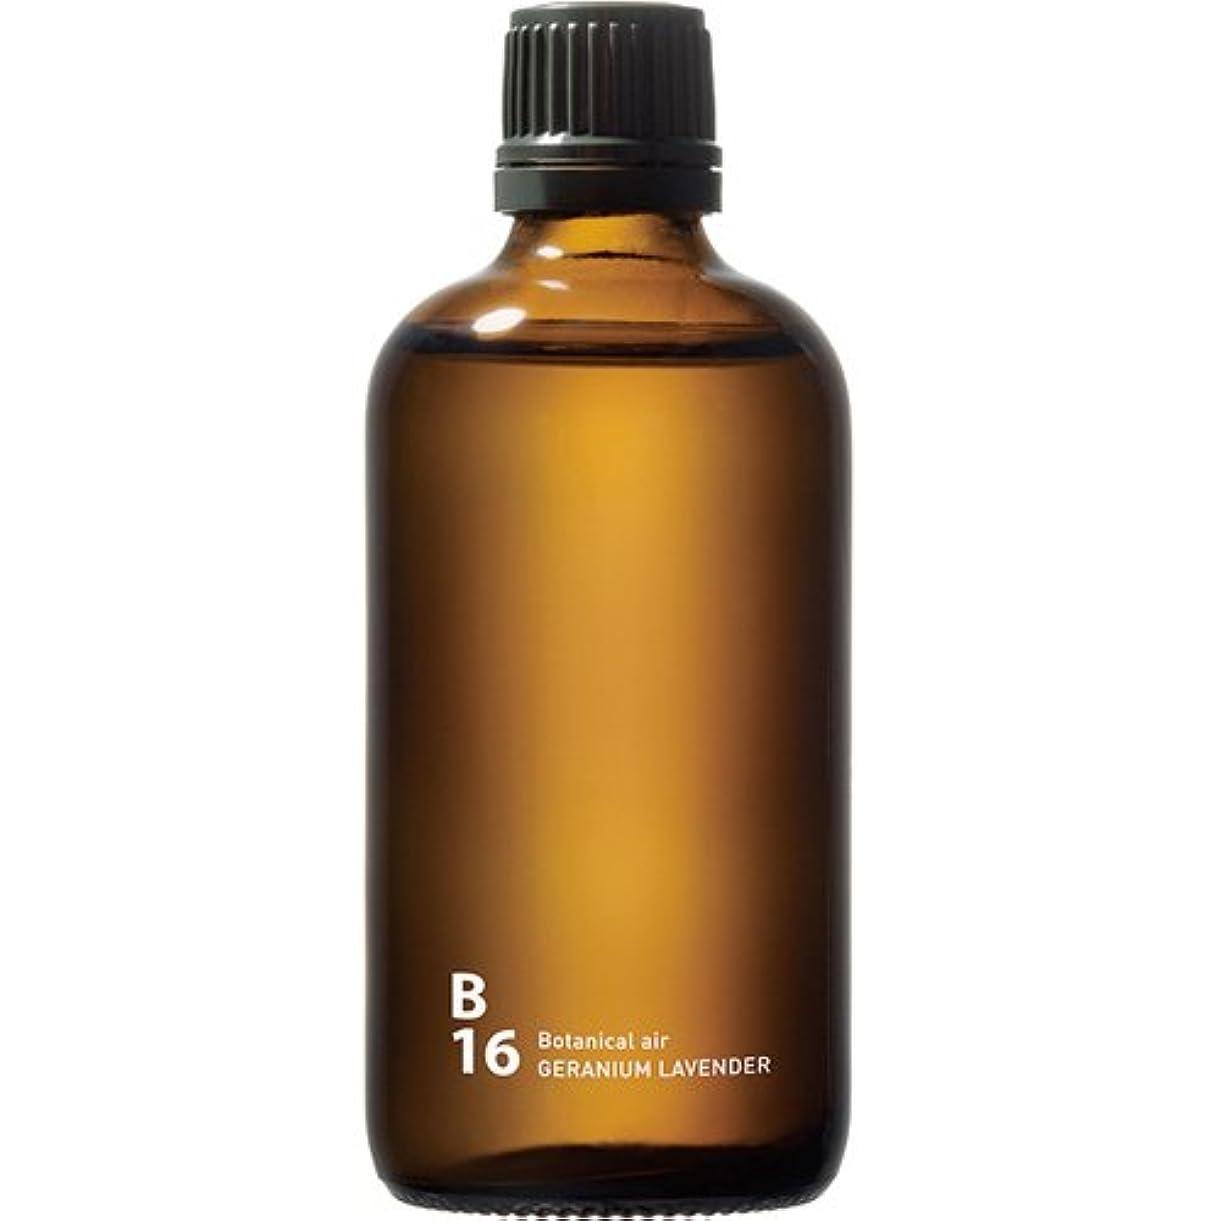 B16 GERANIUM LAVENDER piezo aroma oil 100ml